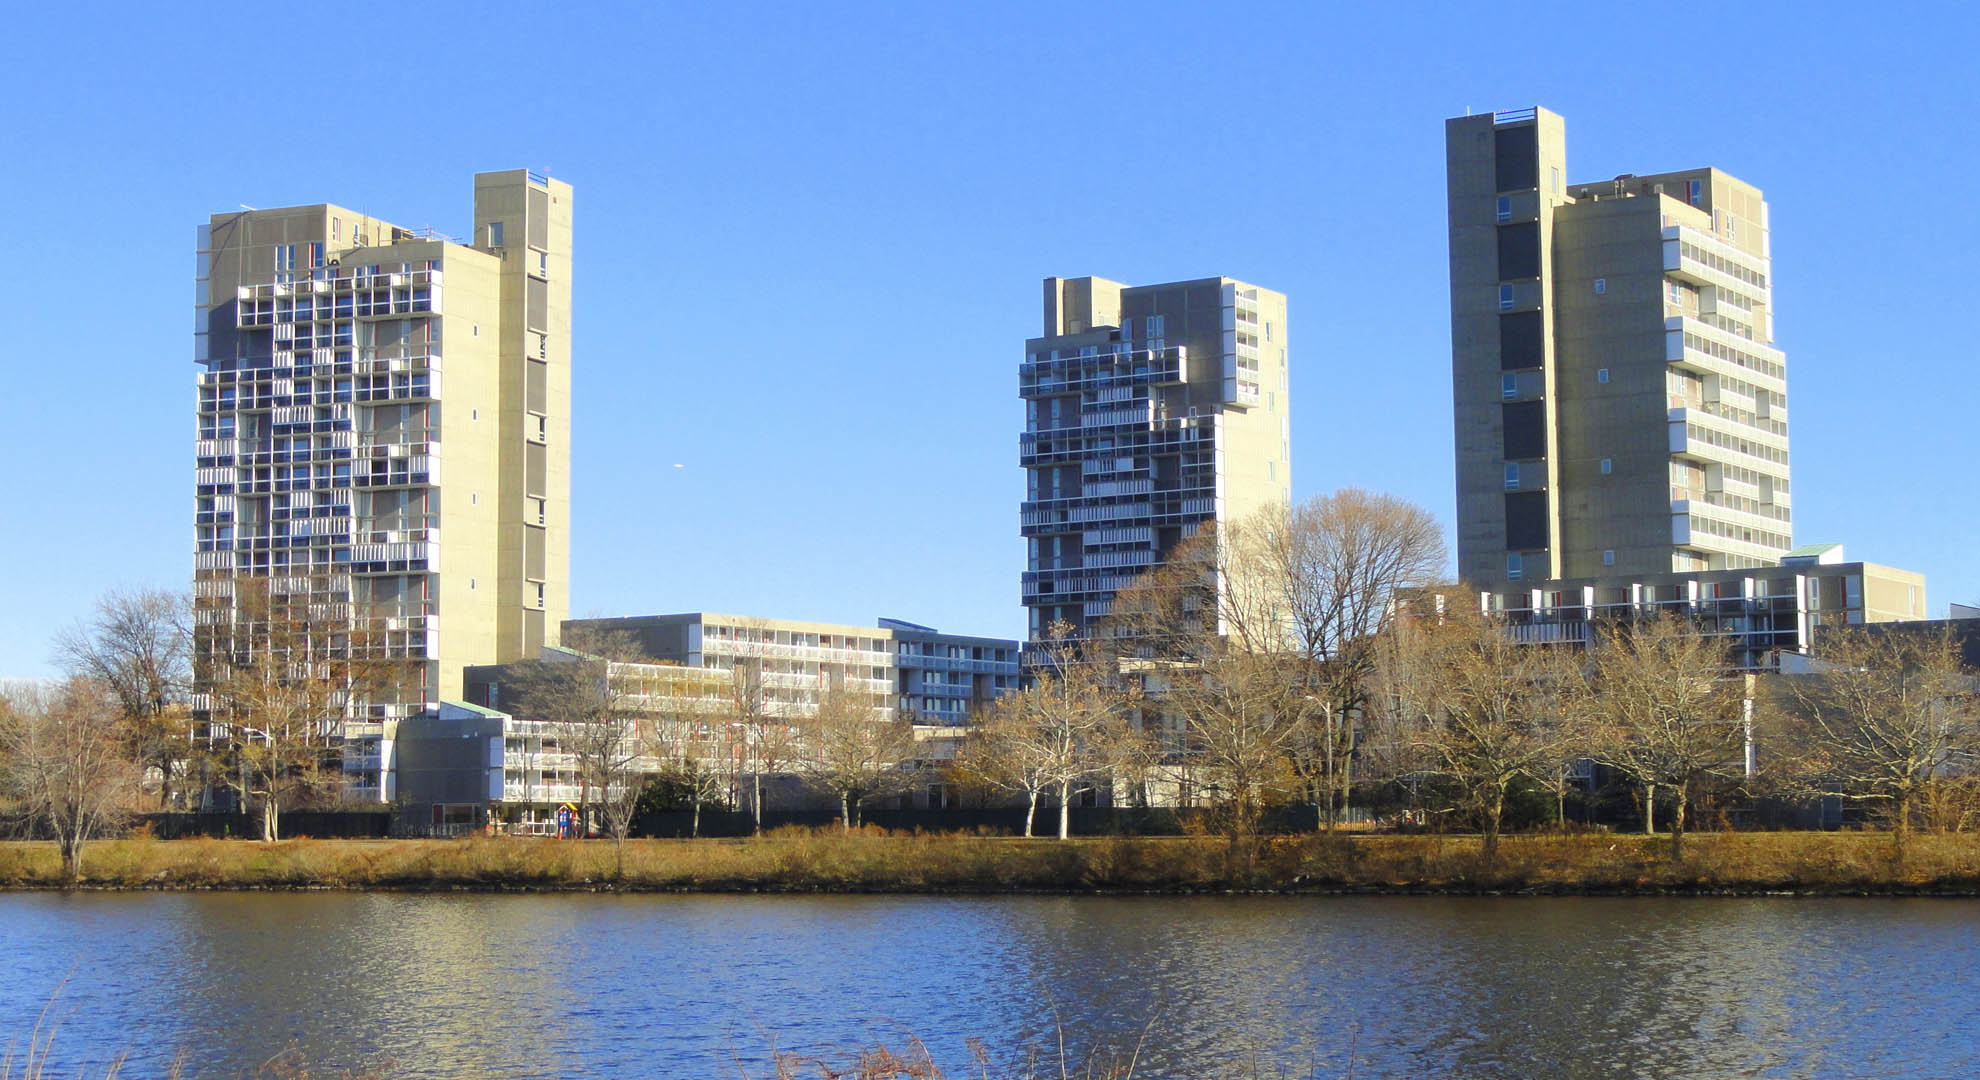 Collective housing in Cambridge, Massachusetts.